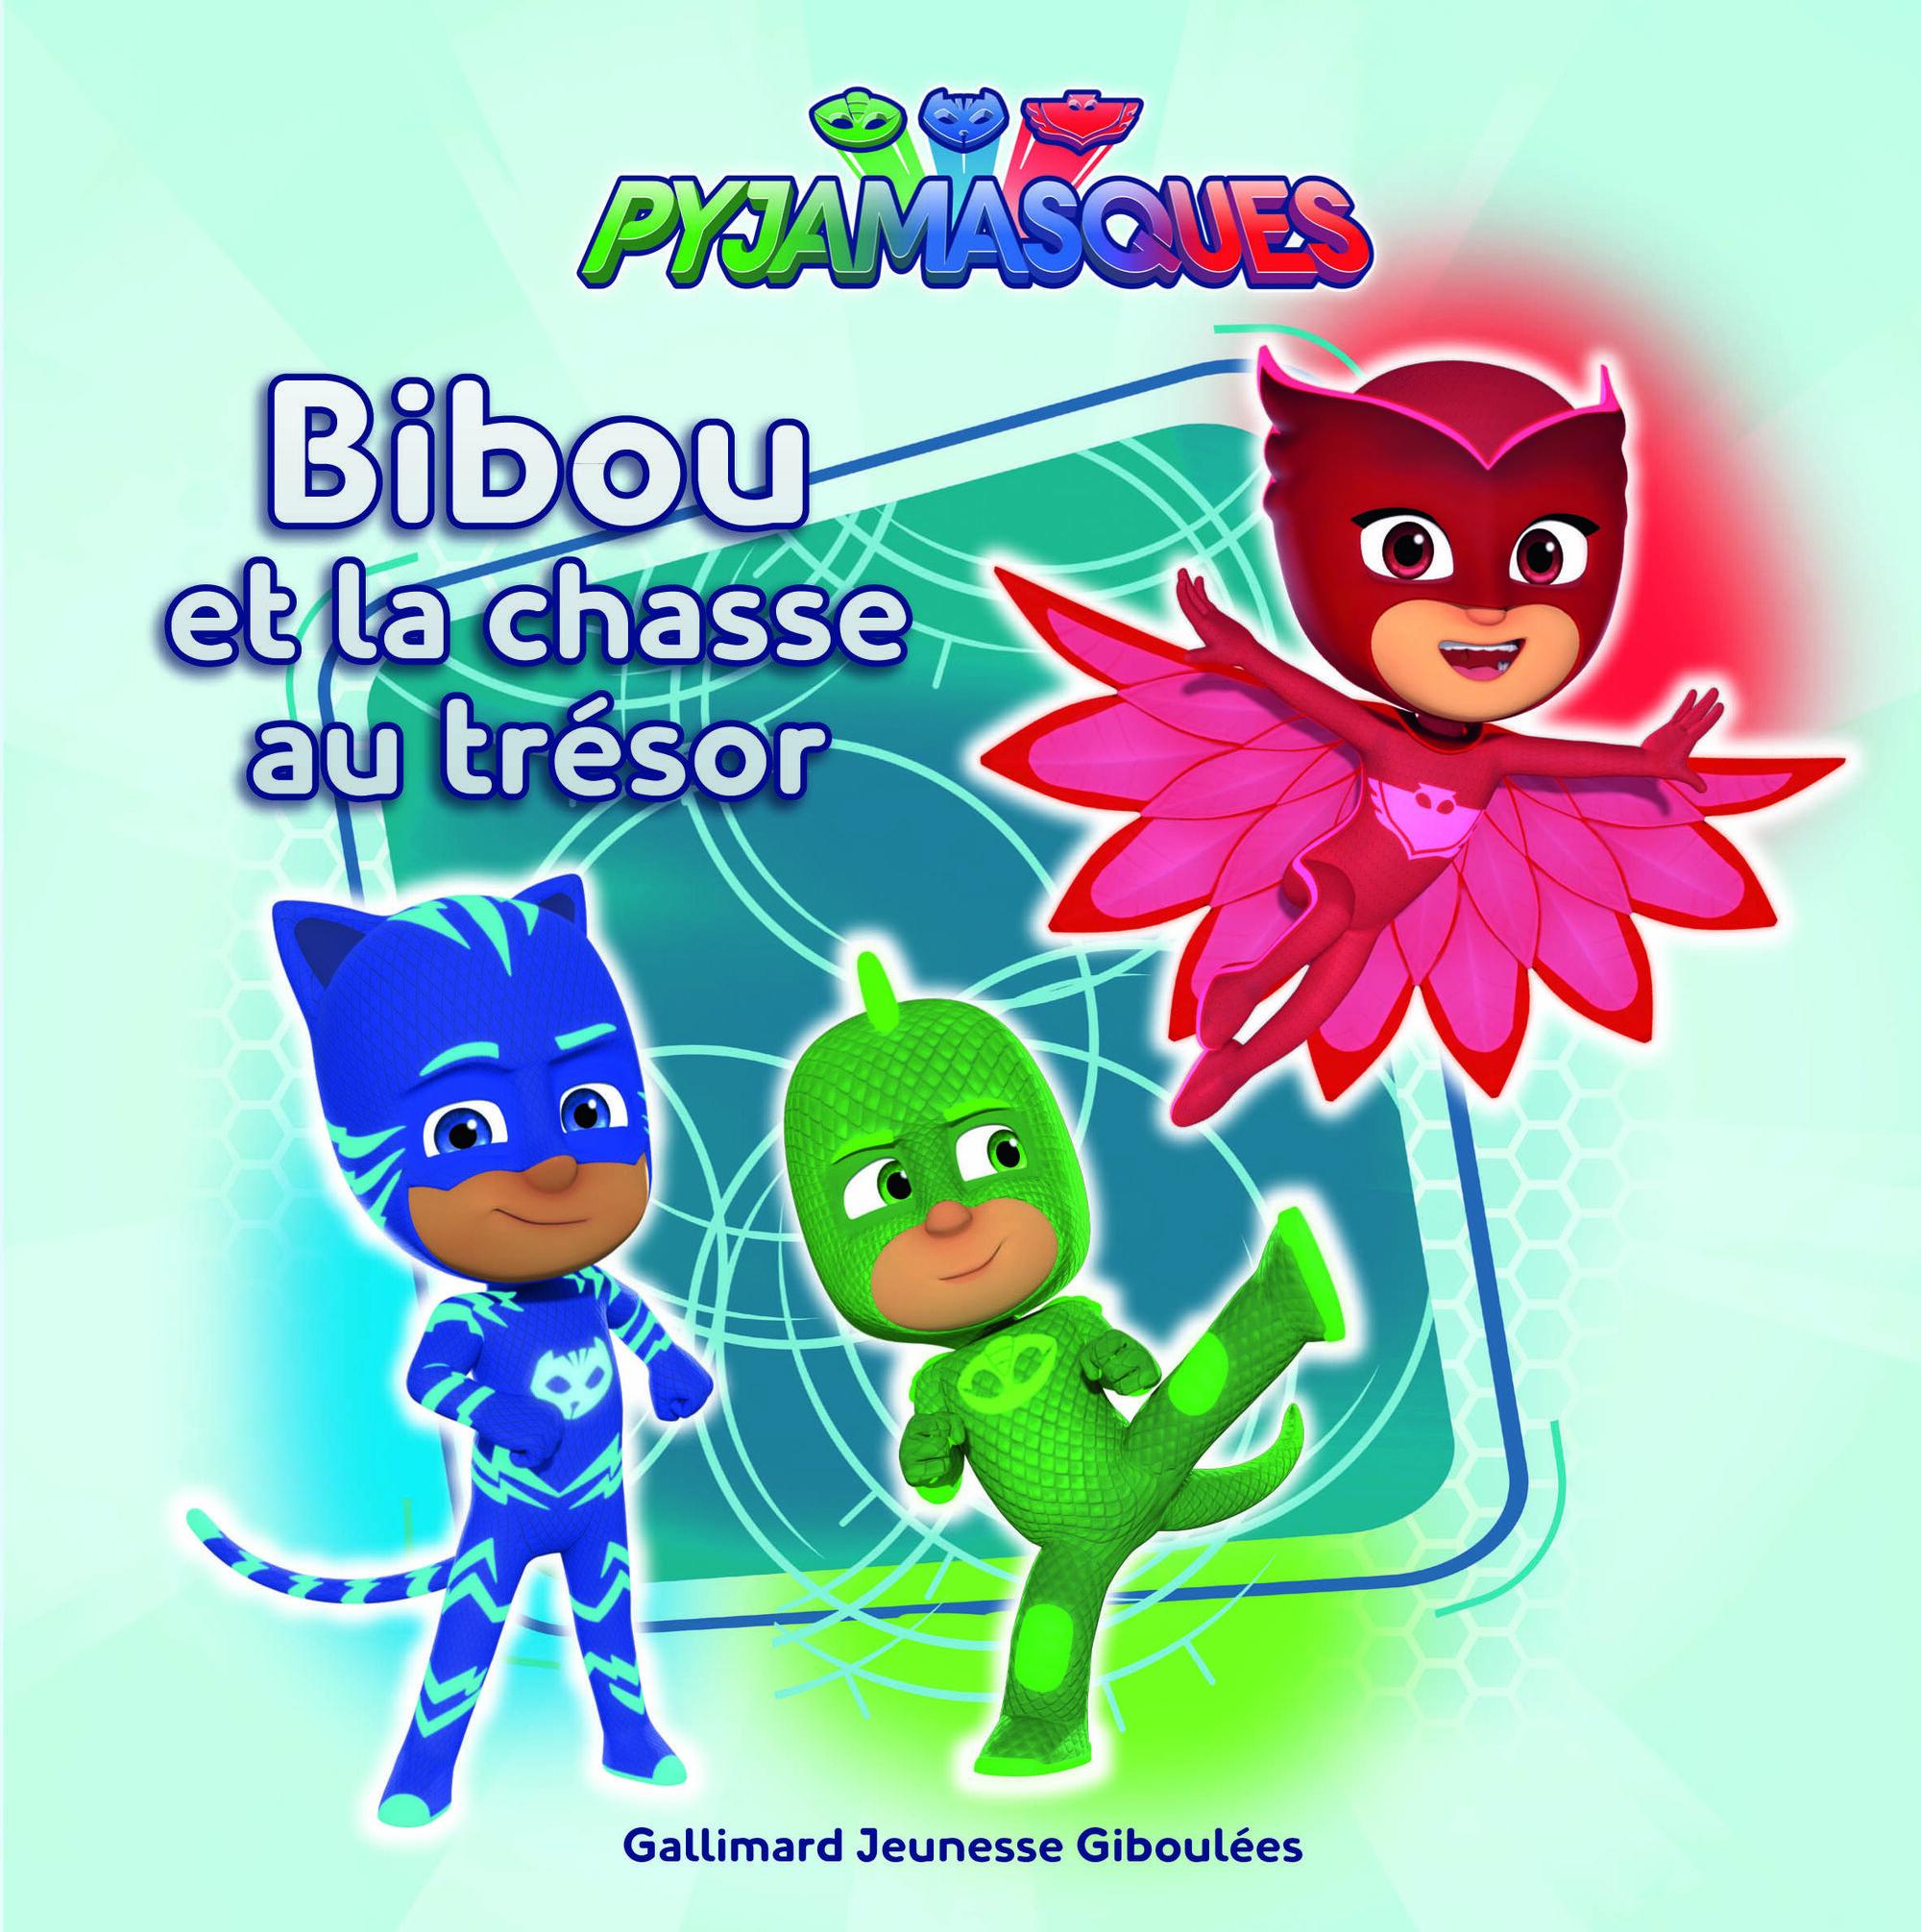 Bibou Et La Chasse Aux Tresors Pj Masks Wiki Fandom Powered By Wikia